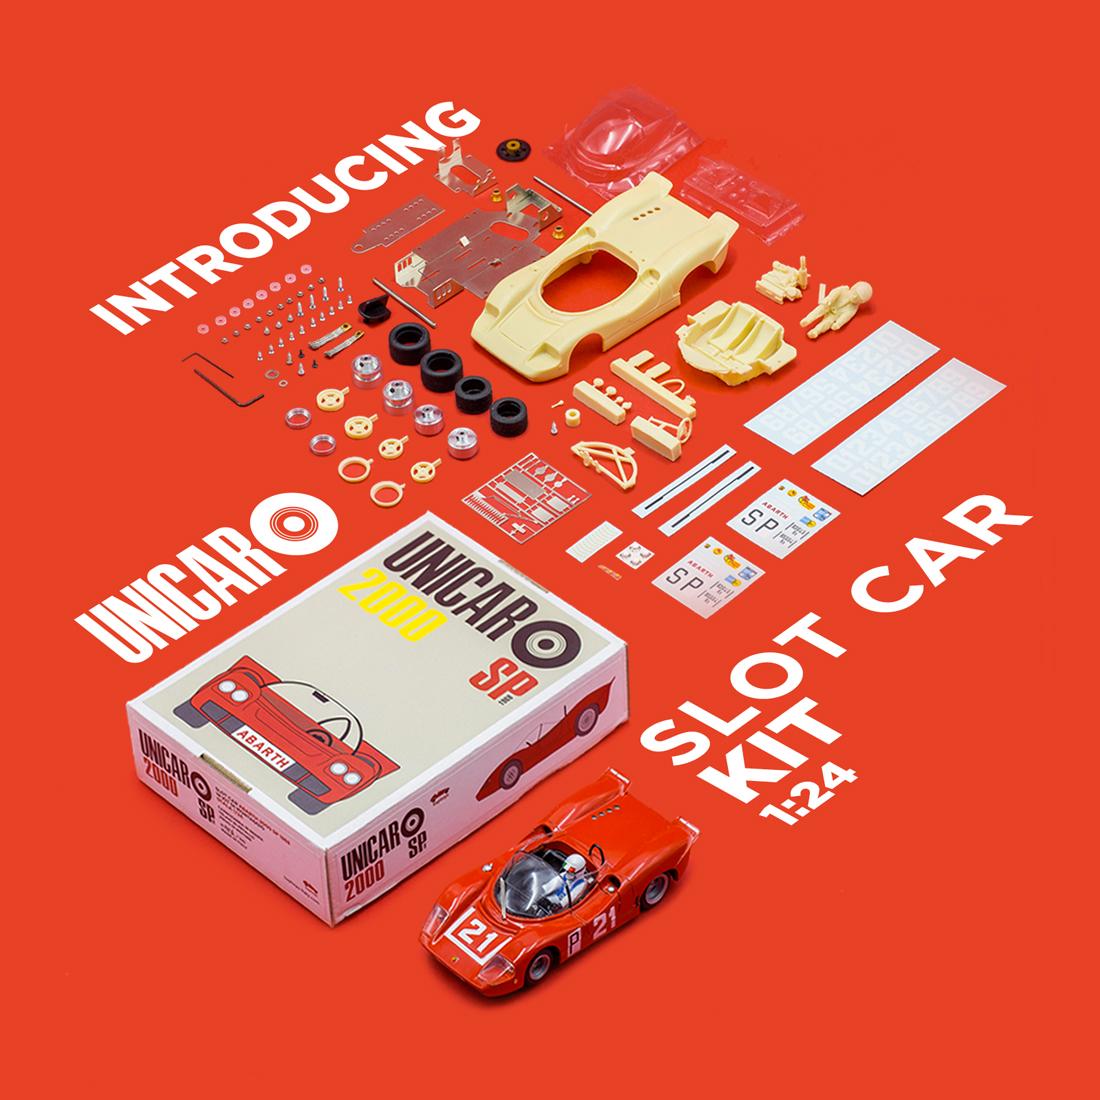 https://www.orlandinifrancesco.com/wp/wp-content/uploads/2019/05/Unicar-Slot-Car-Kit-Abarth-SP-2000SQUARE1100.jpg